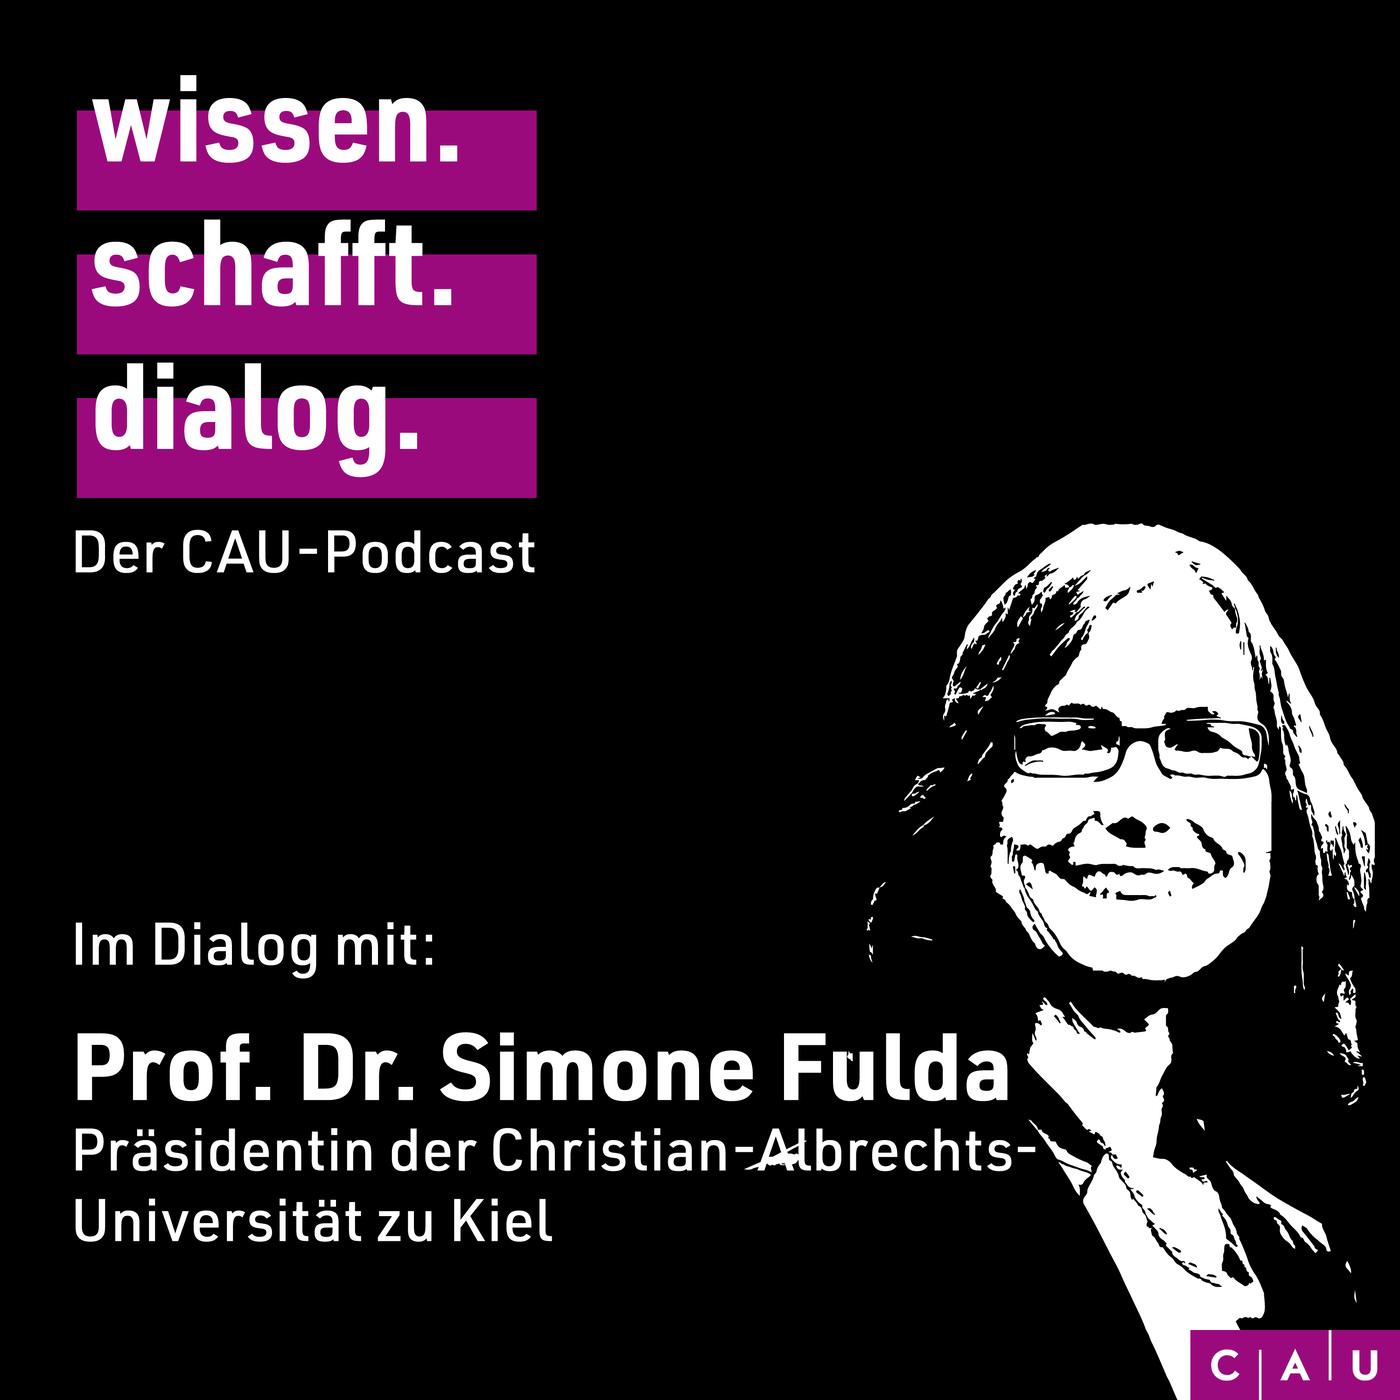 Im Dialog mit: Prof. Dr. Simone Fulda